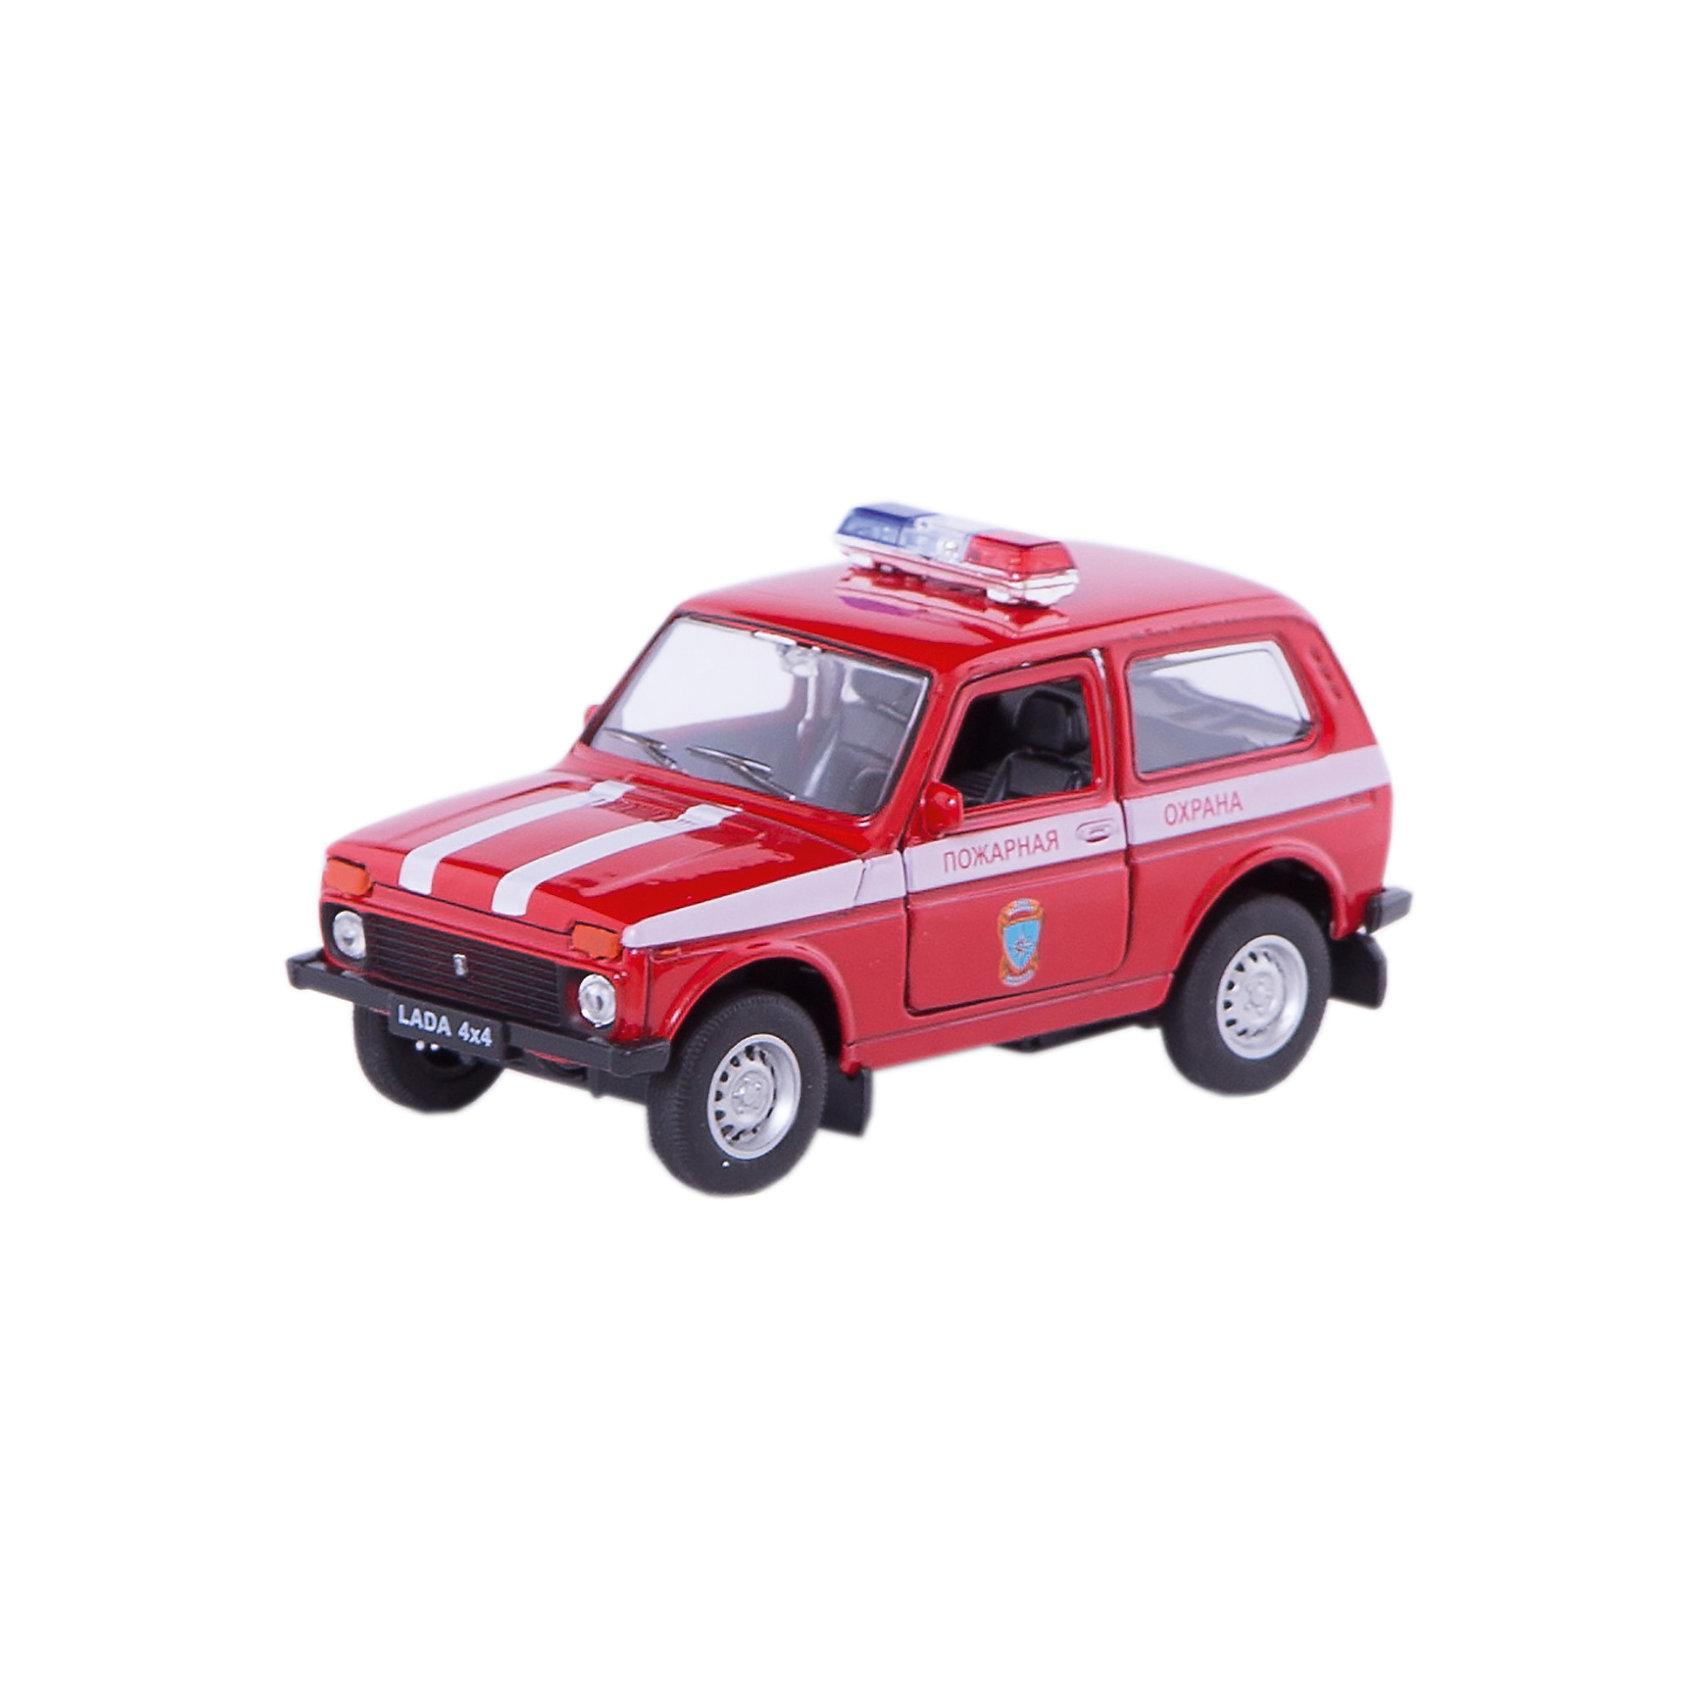 Welly Welly Модель машины 1:34-39 LADA Пожарная охрана машины welly модель машины 1 34 39 lada granta пожарная охрана page 10